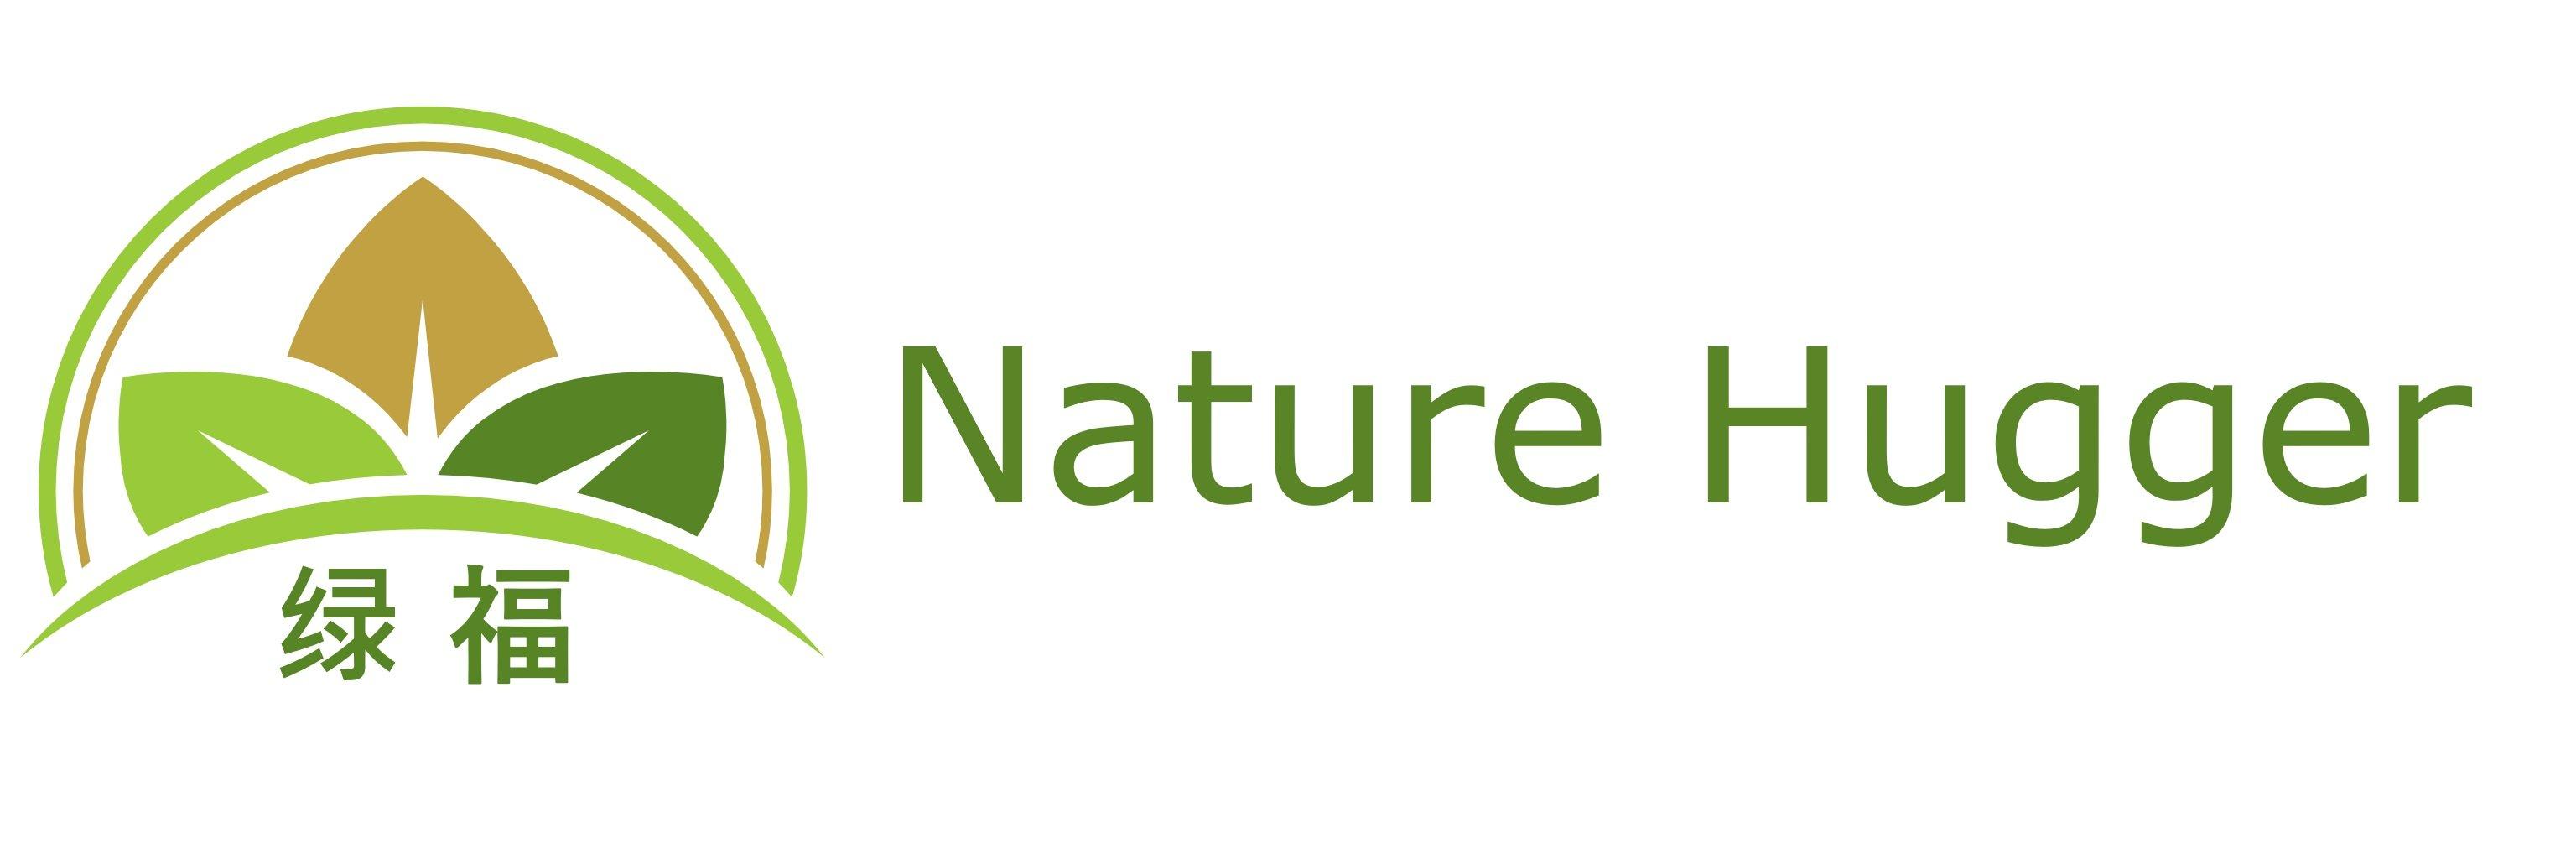 Nature Hugger